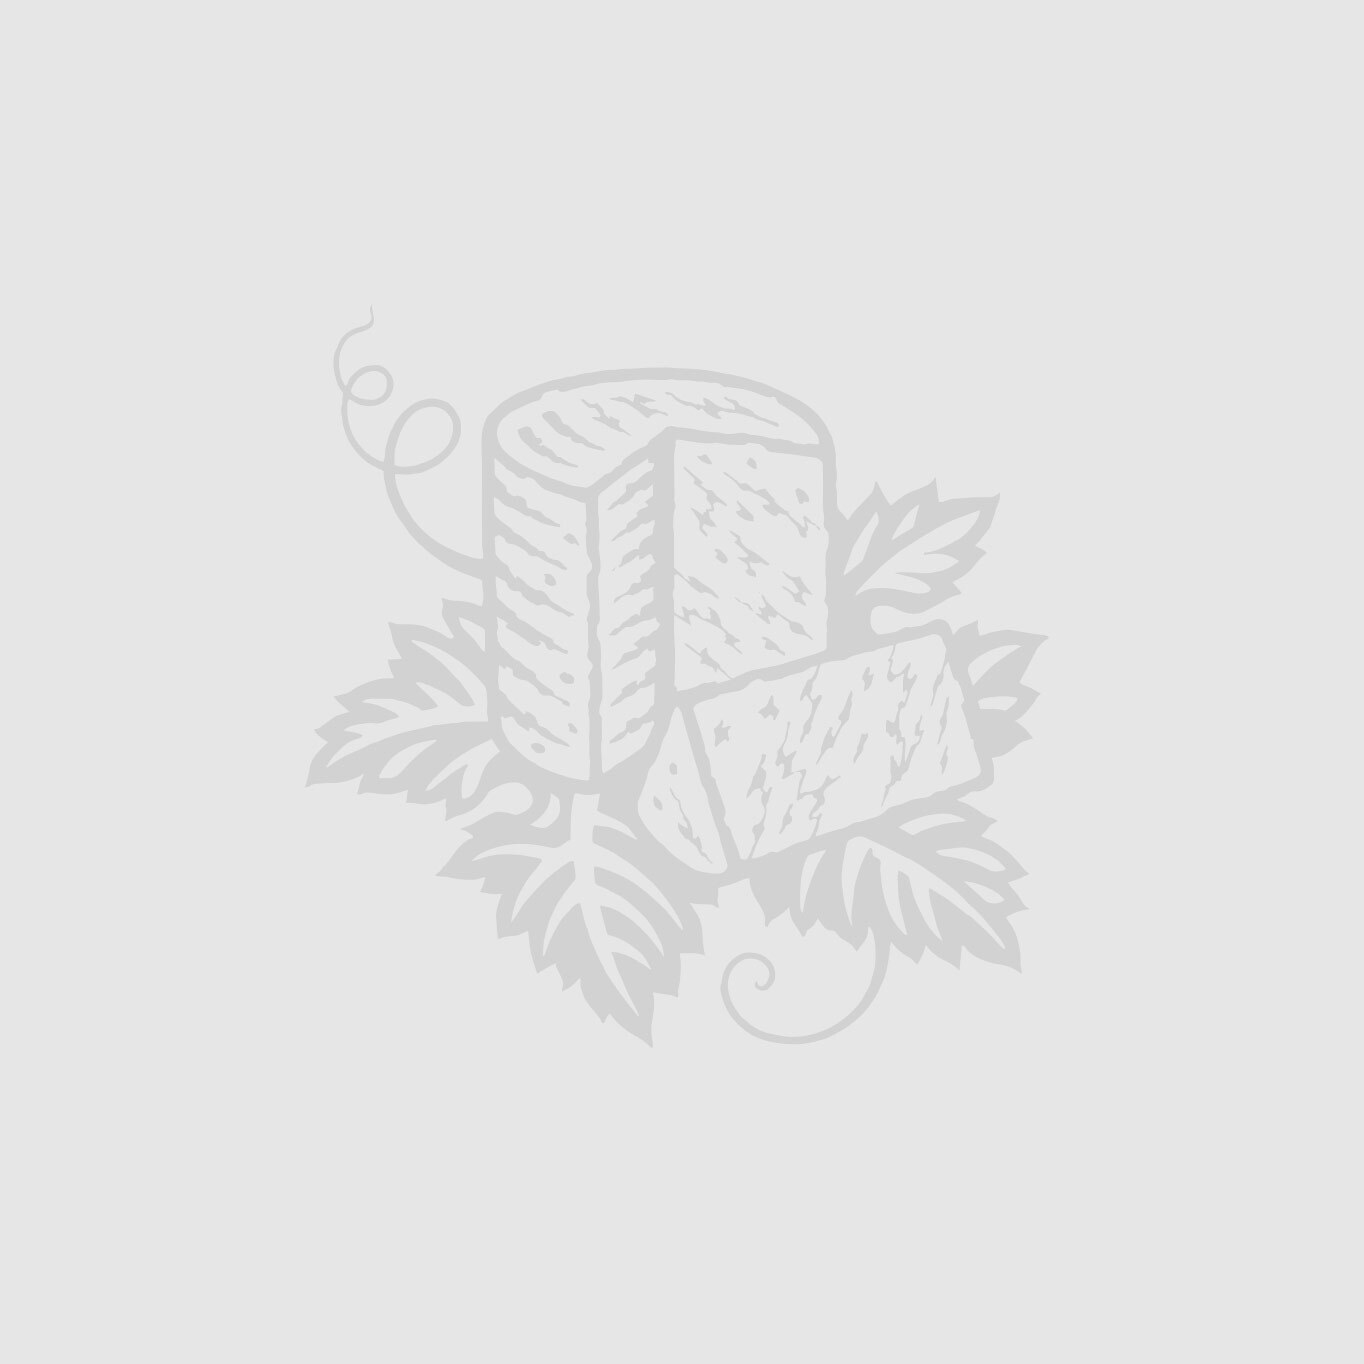 Loison Cherry Panettoncino 100g